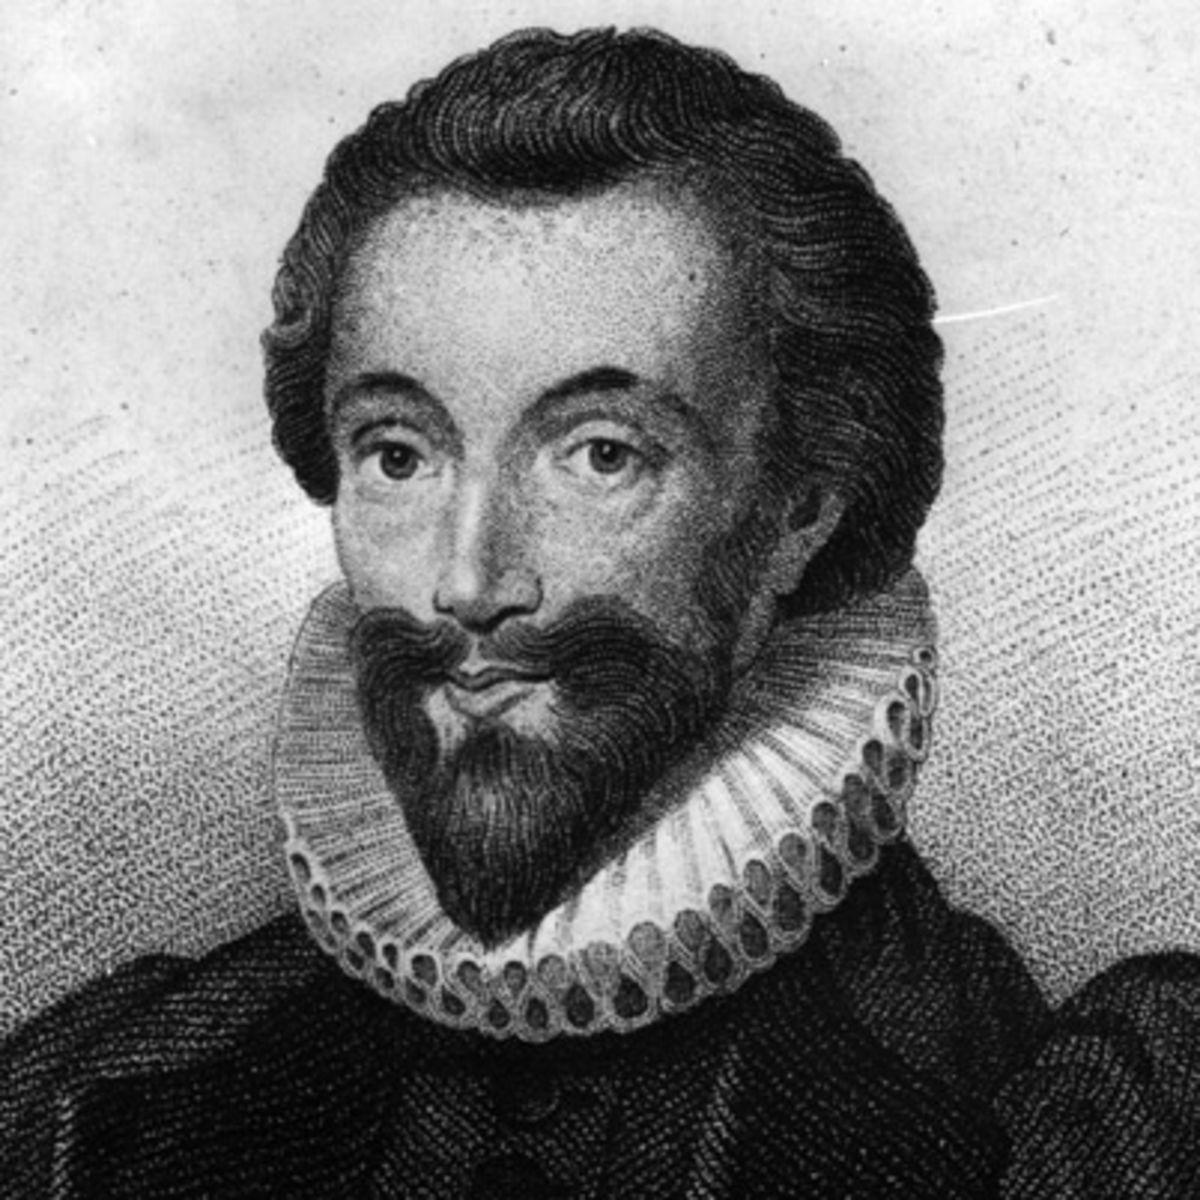 John Donne, poeta, Londres, 1572-1631